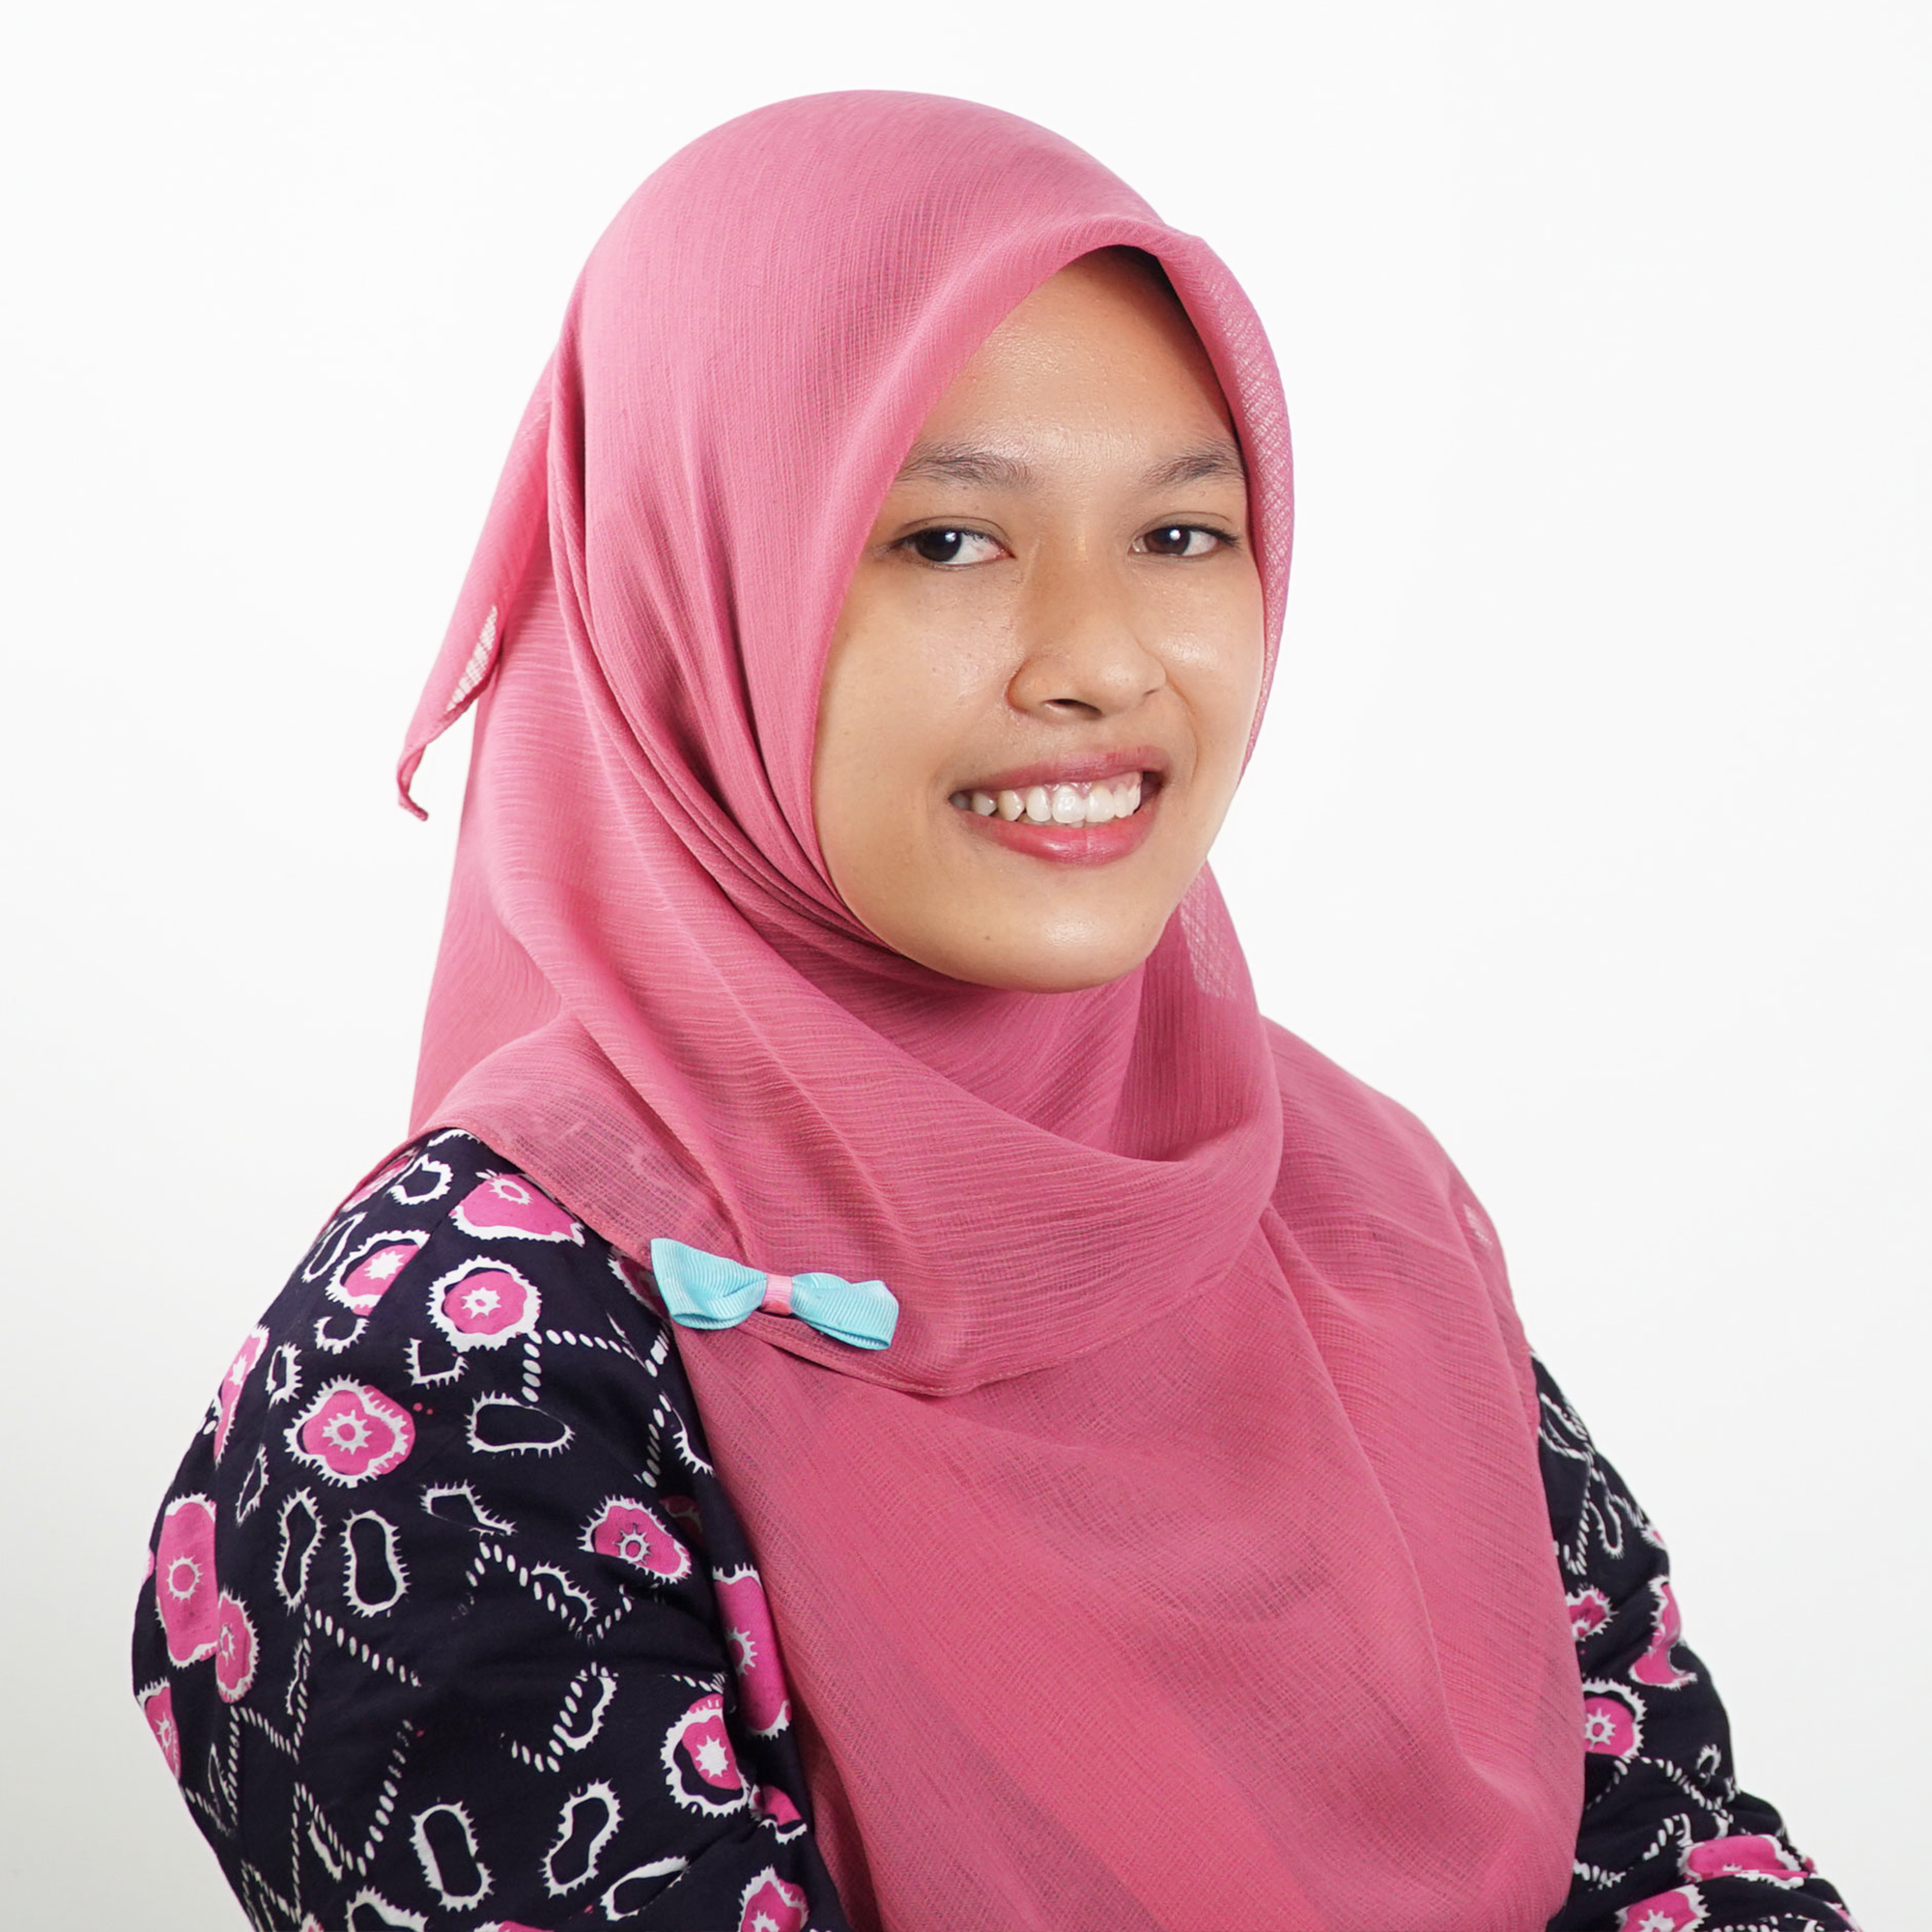 Umirta Imaddini